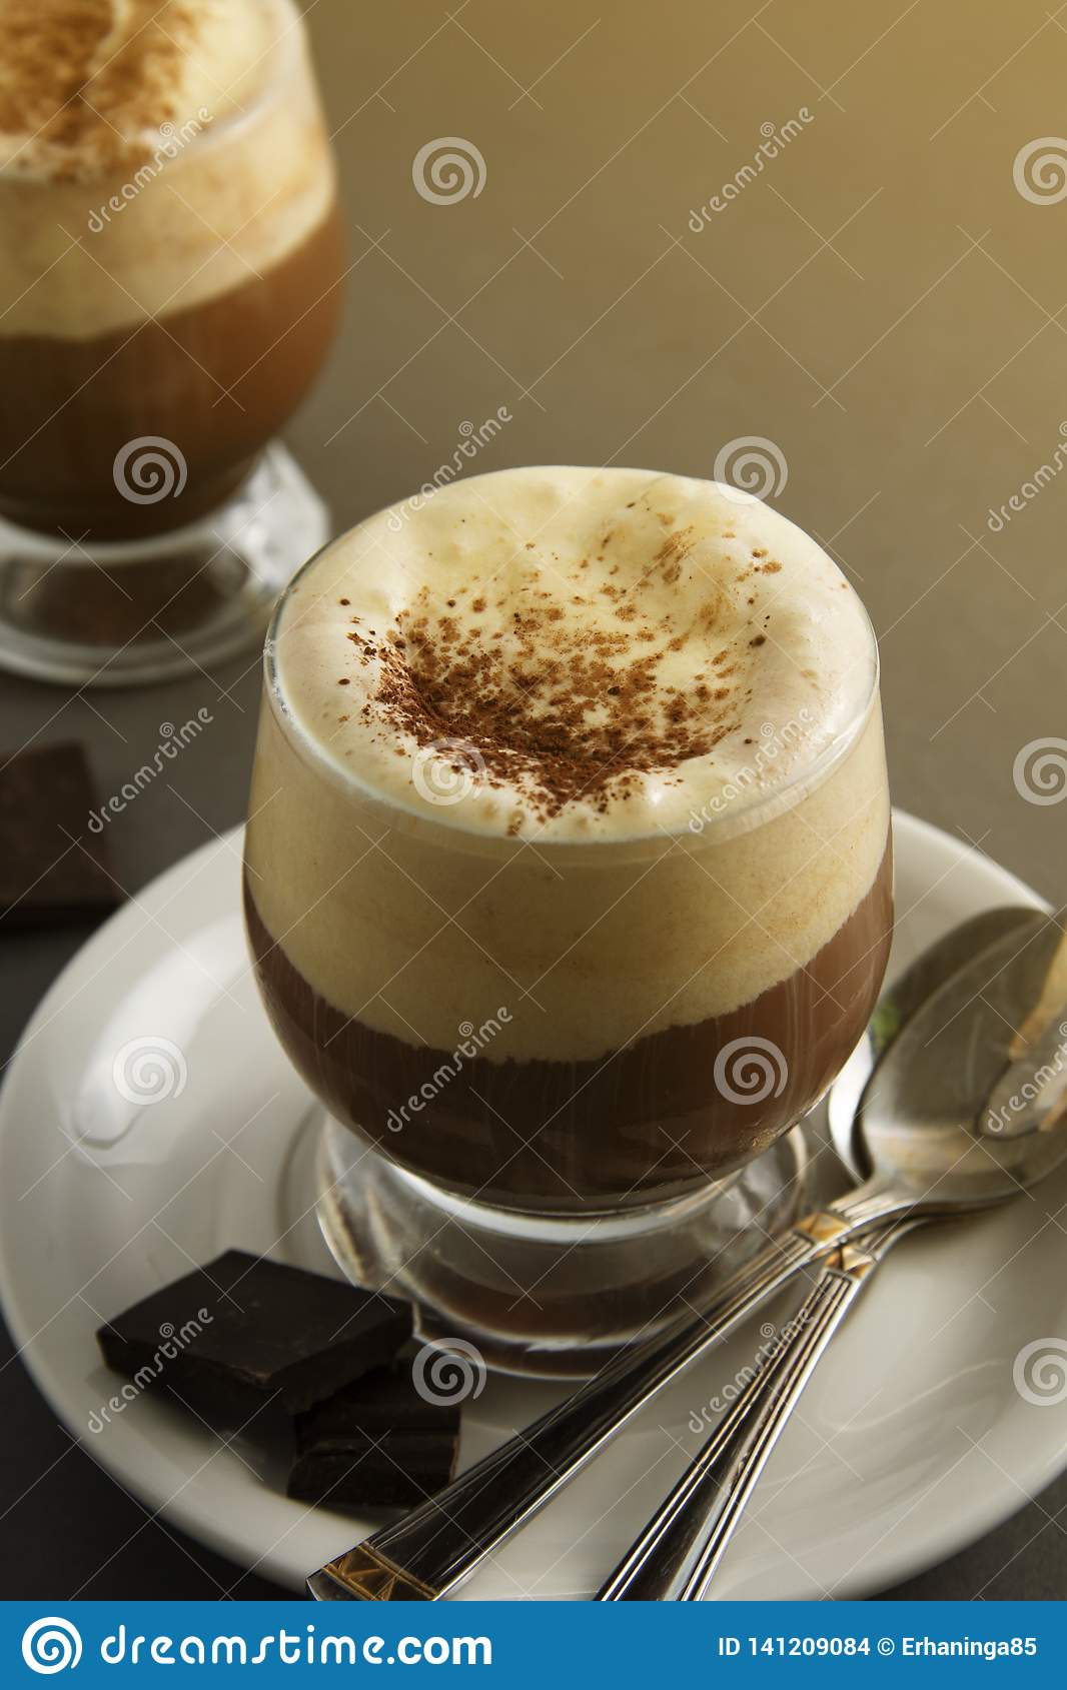 Coffee affogato with vanilla ice cream and espresso. Glass with coffee drink and icecream. Copy space